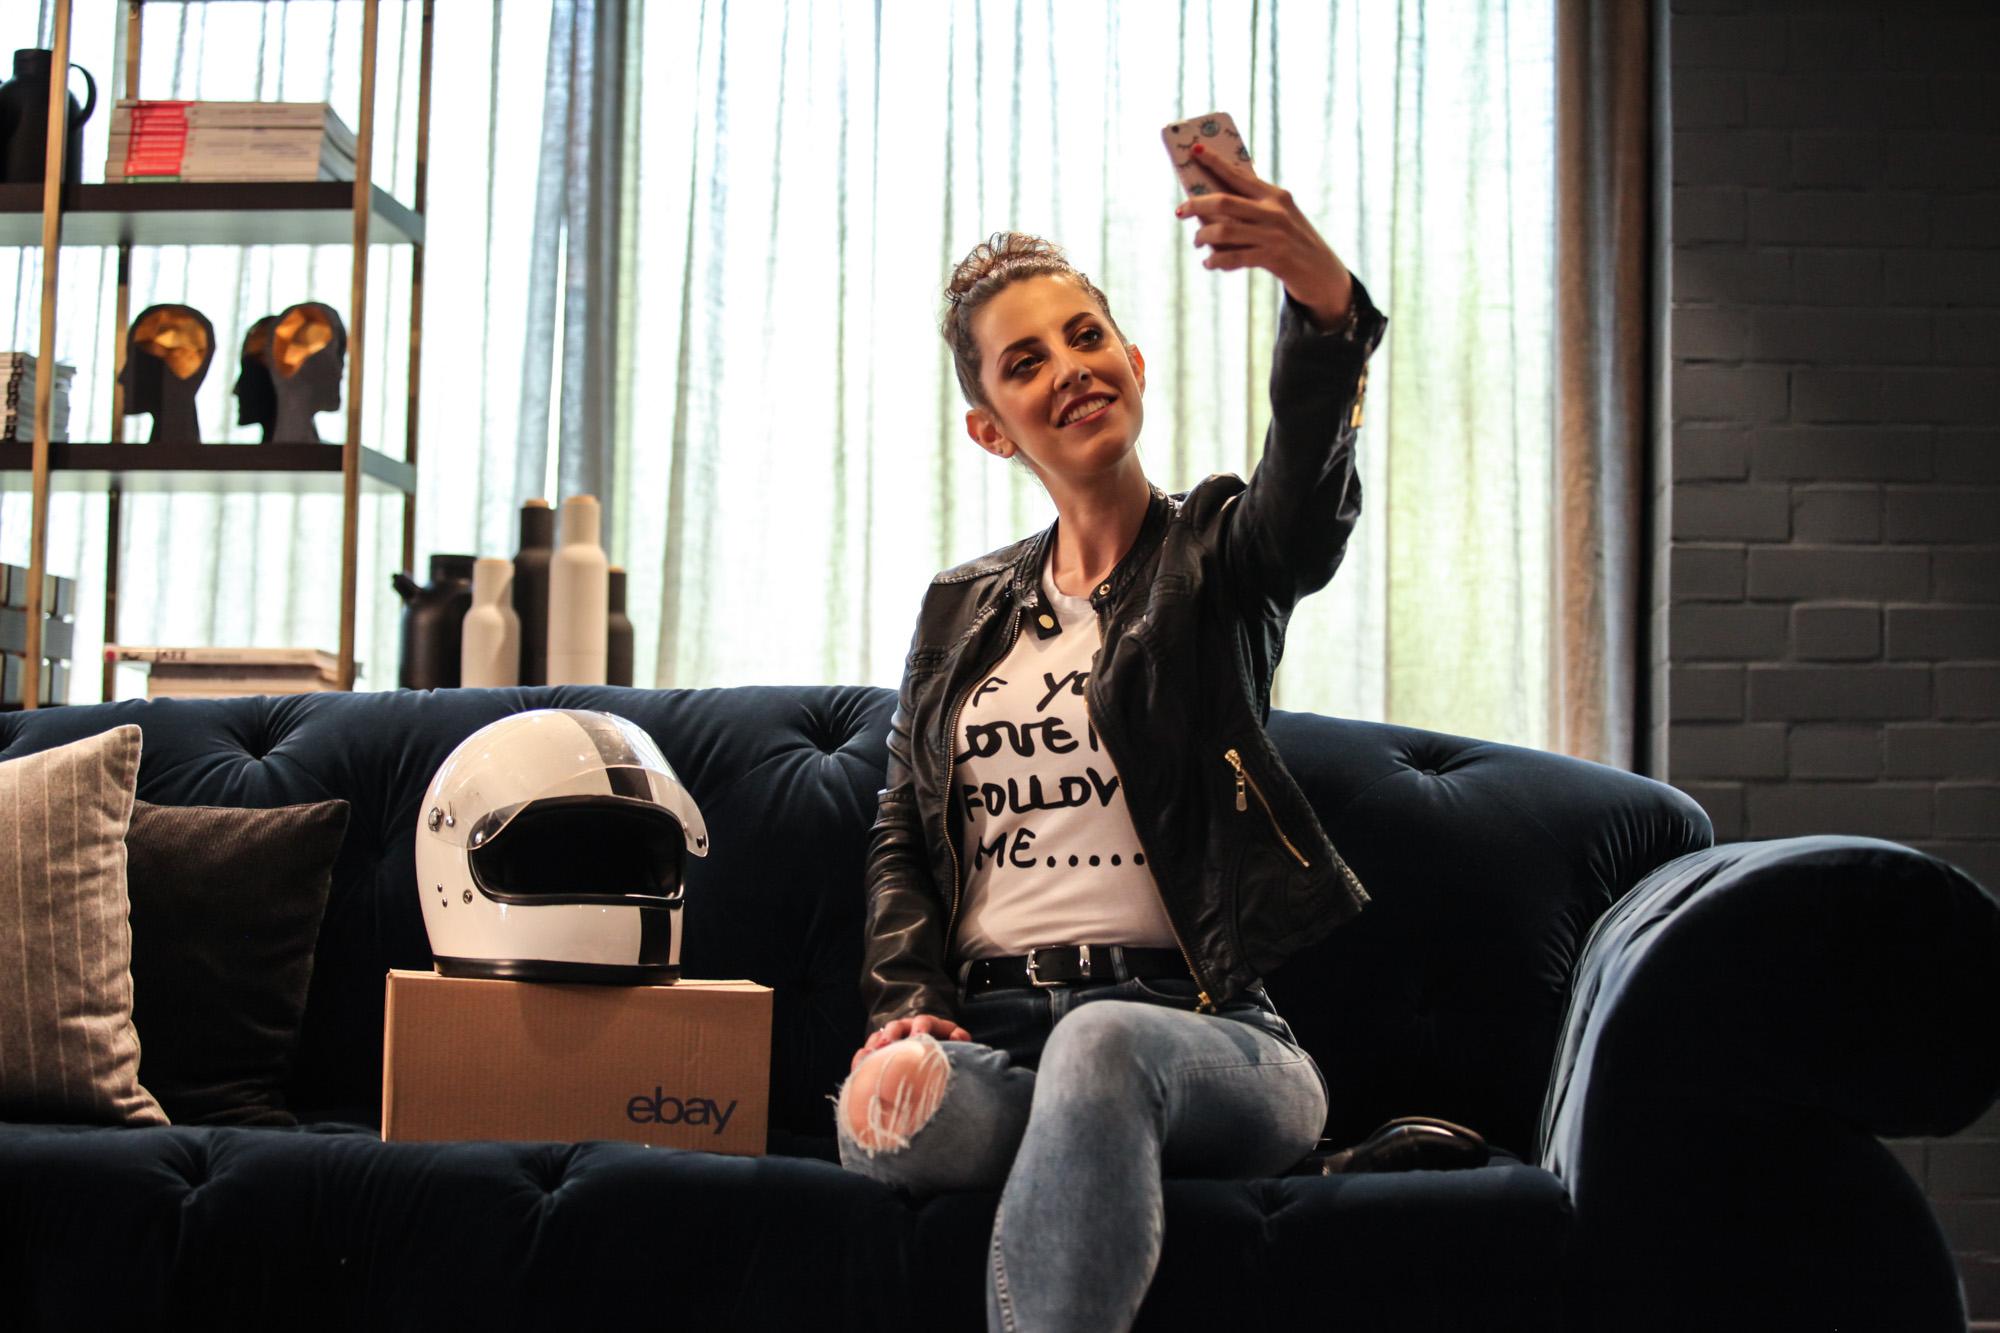 Tatiana Biggi from Tati loves pearls for Ebay.it